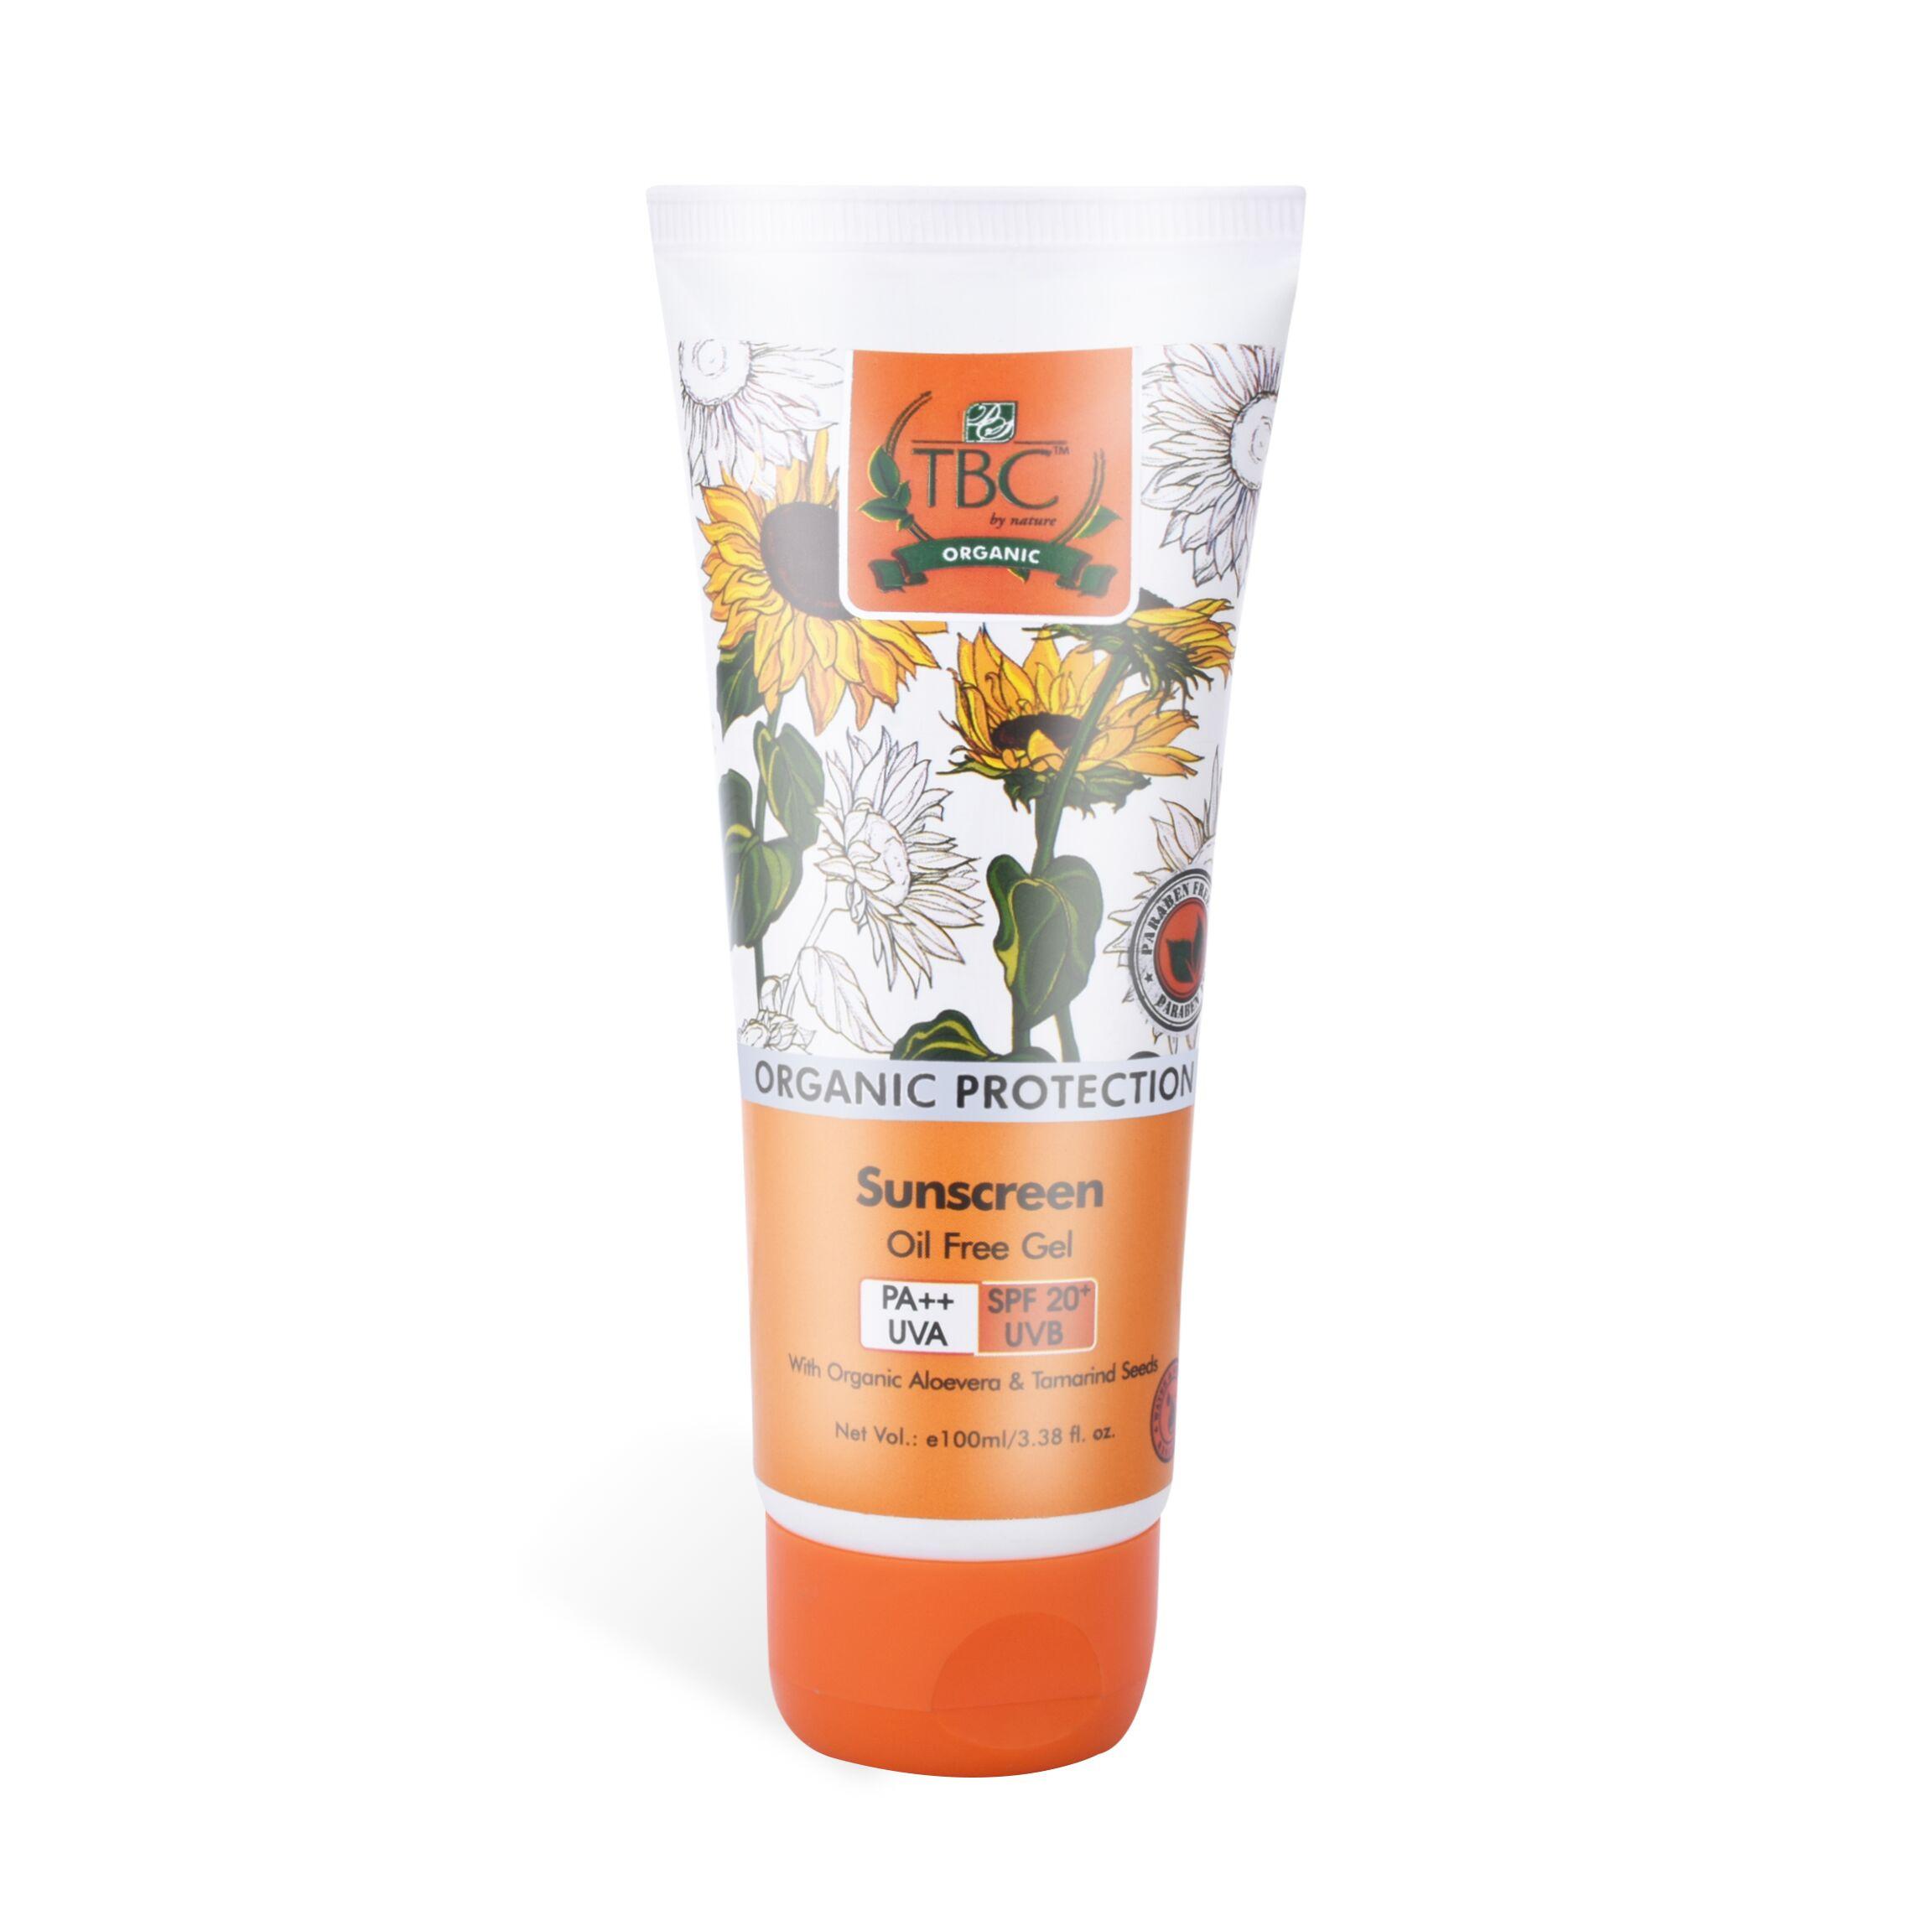 TBC Organic Sunscreen Oil Free Gel Spf 20+ 120ml